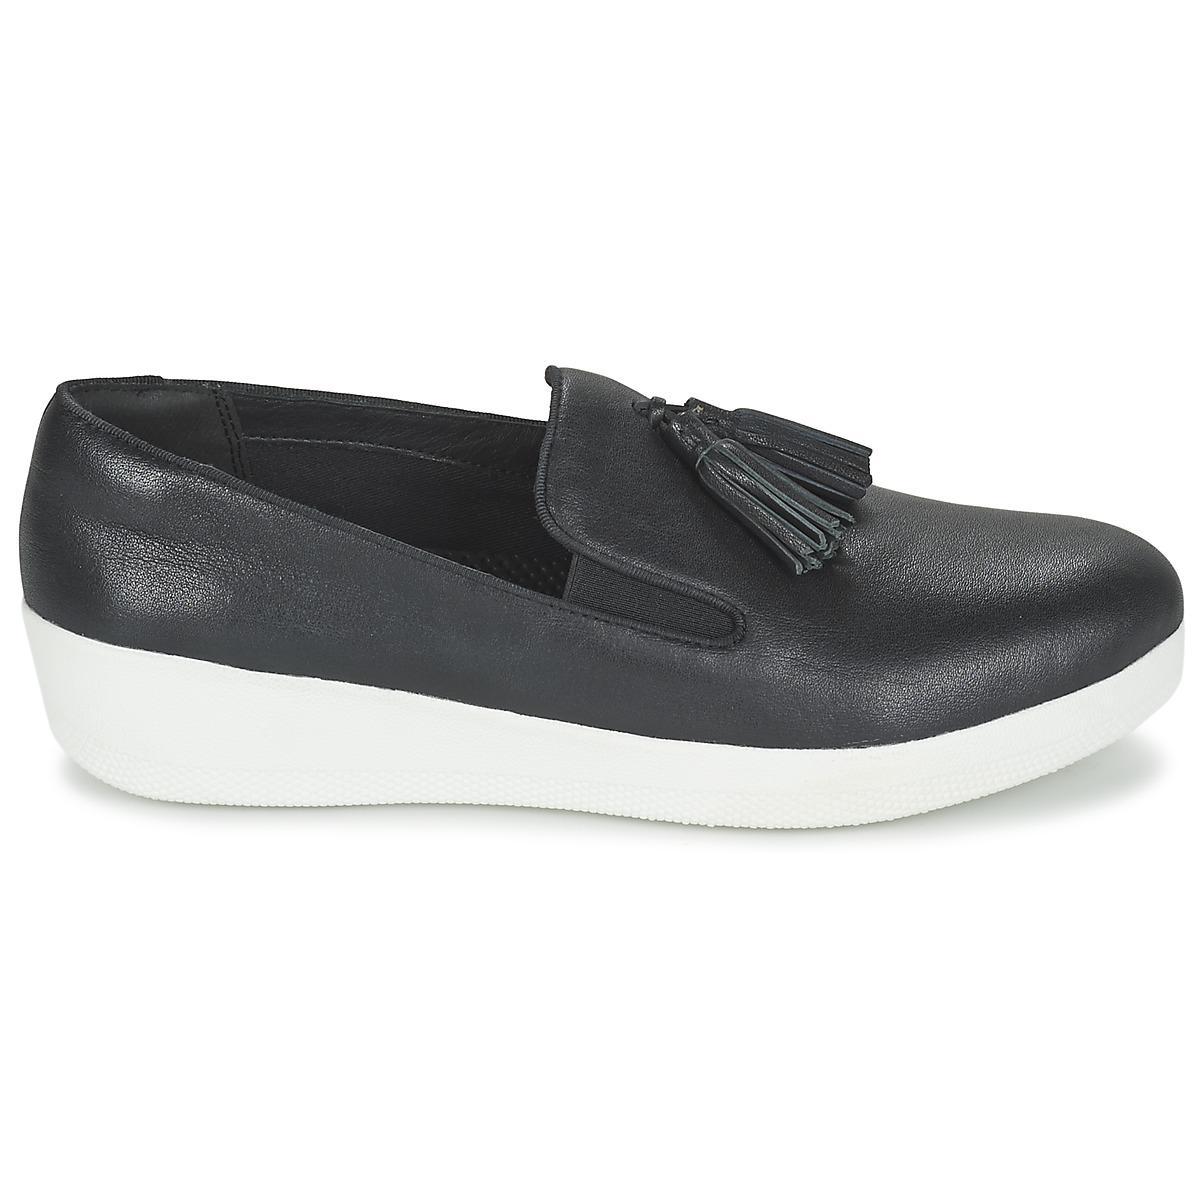 cb658a68a763a Fitflop - Tassel Superskate Women s Slip-ons (shoes) In Black - Lyst. View  fullscreen